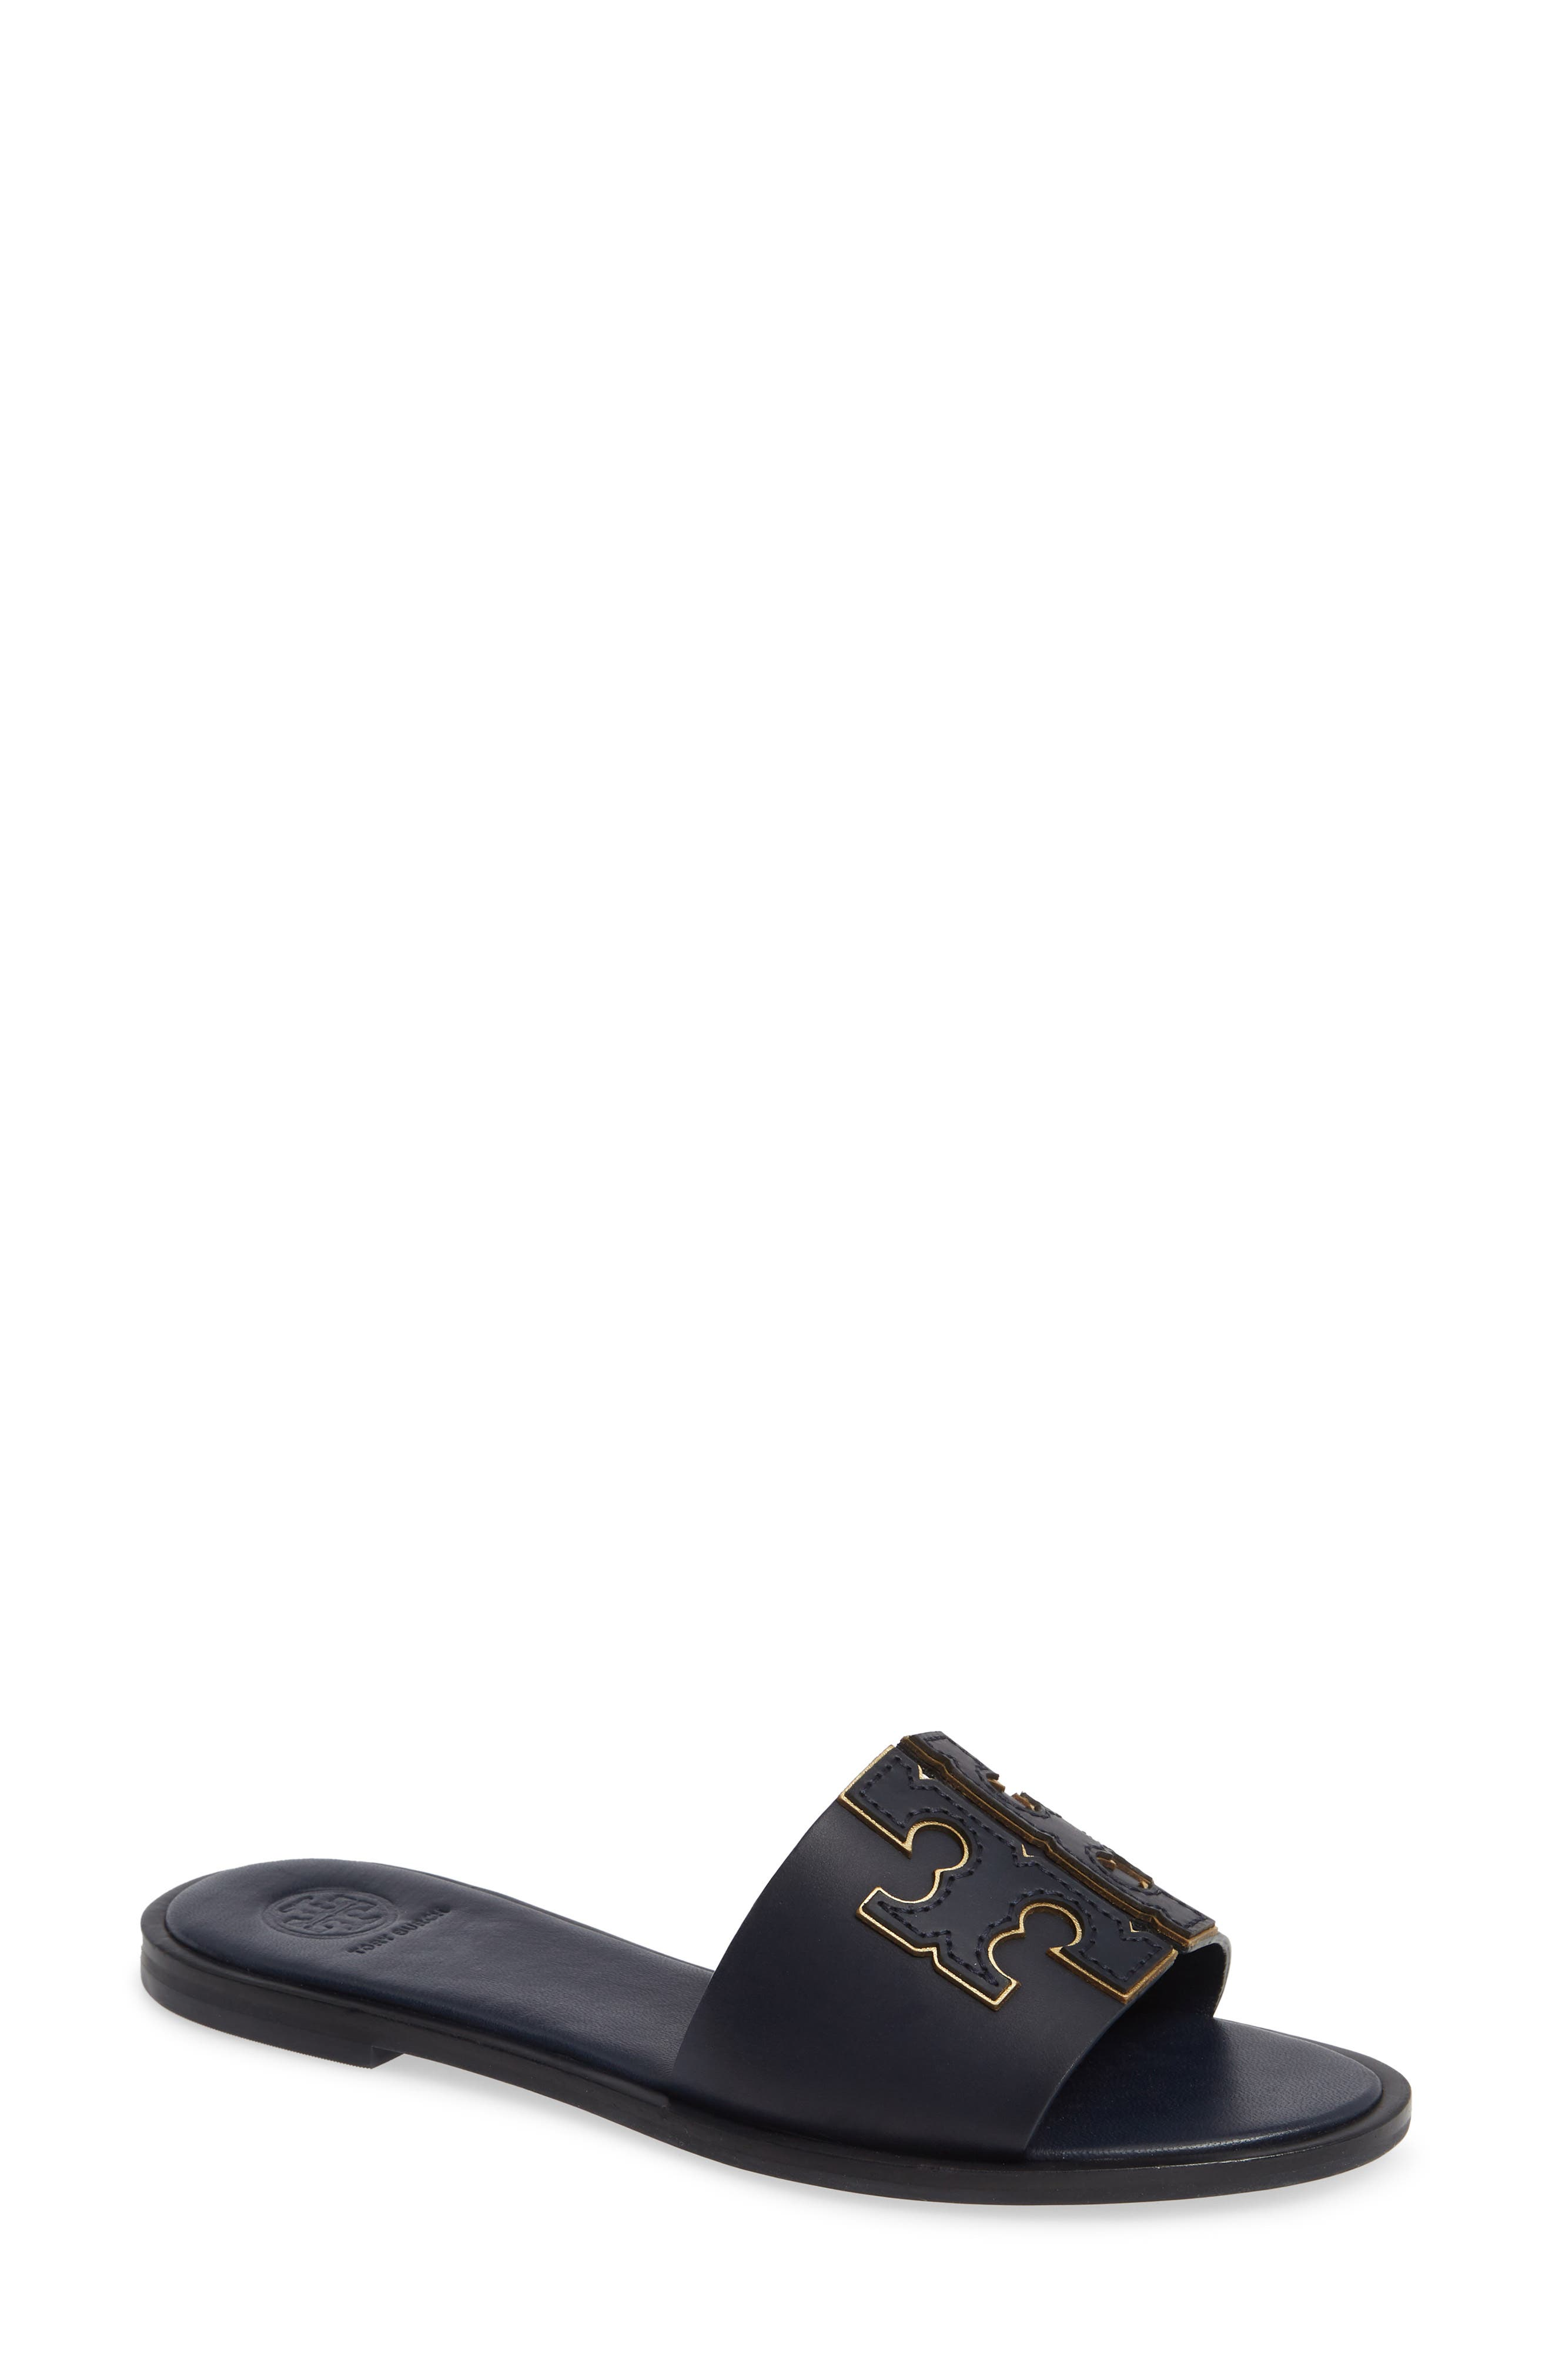 Tory Burch Ines Slide Sandal- Blue